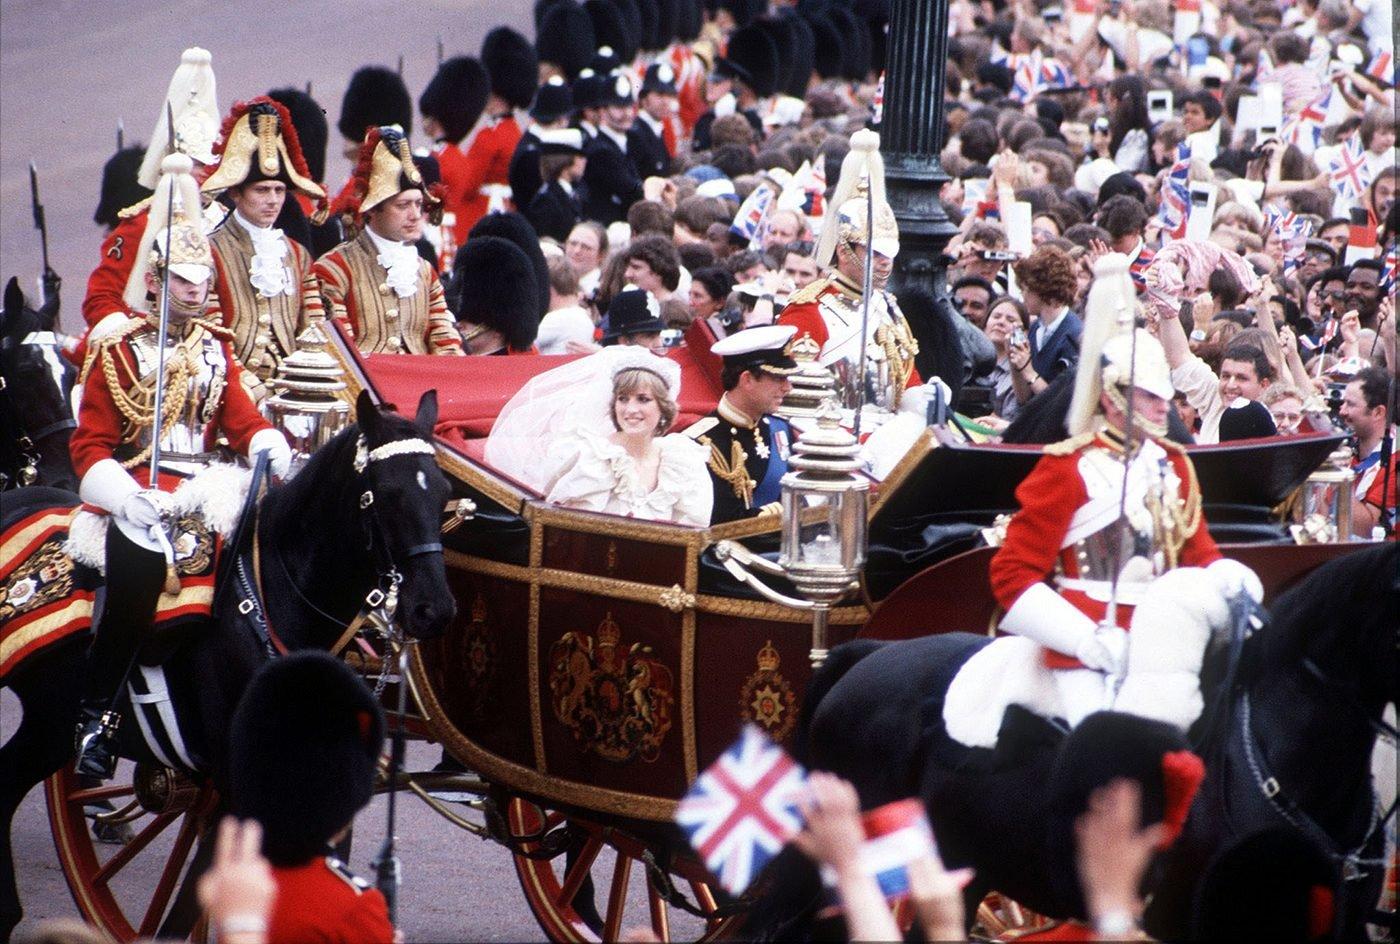 Prince Charles and Princess Diana wedding carriage ride